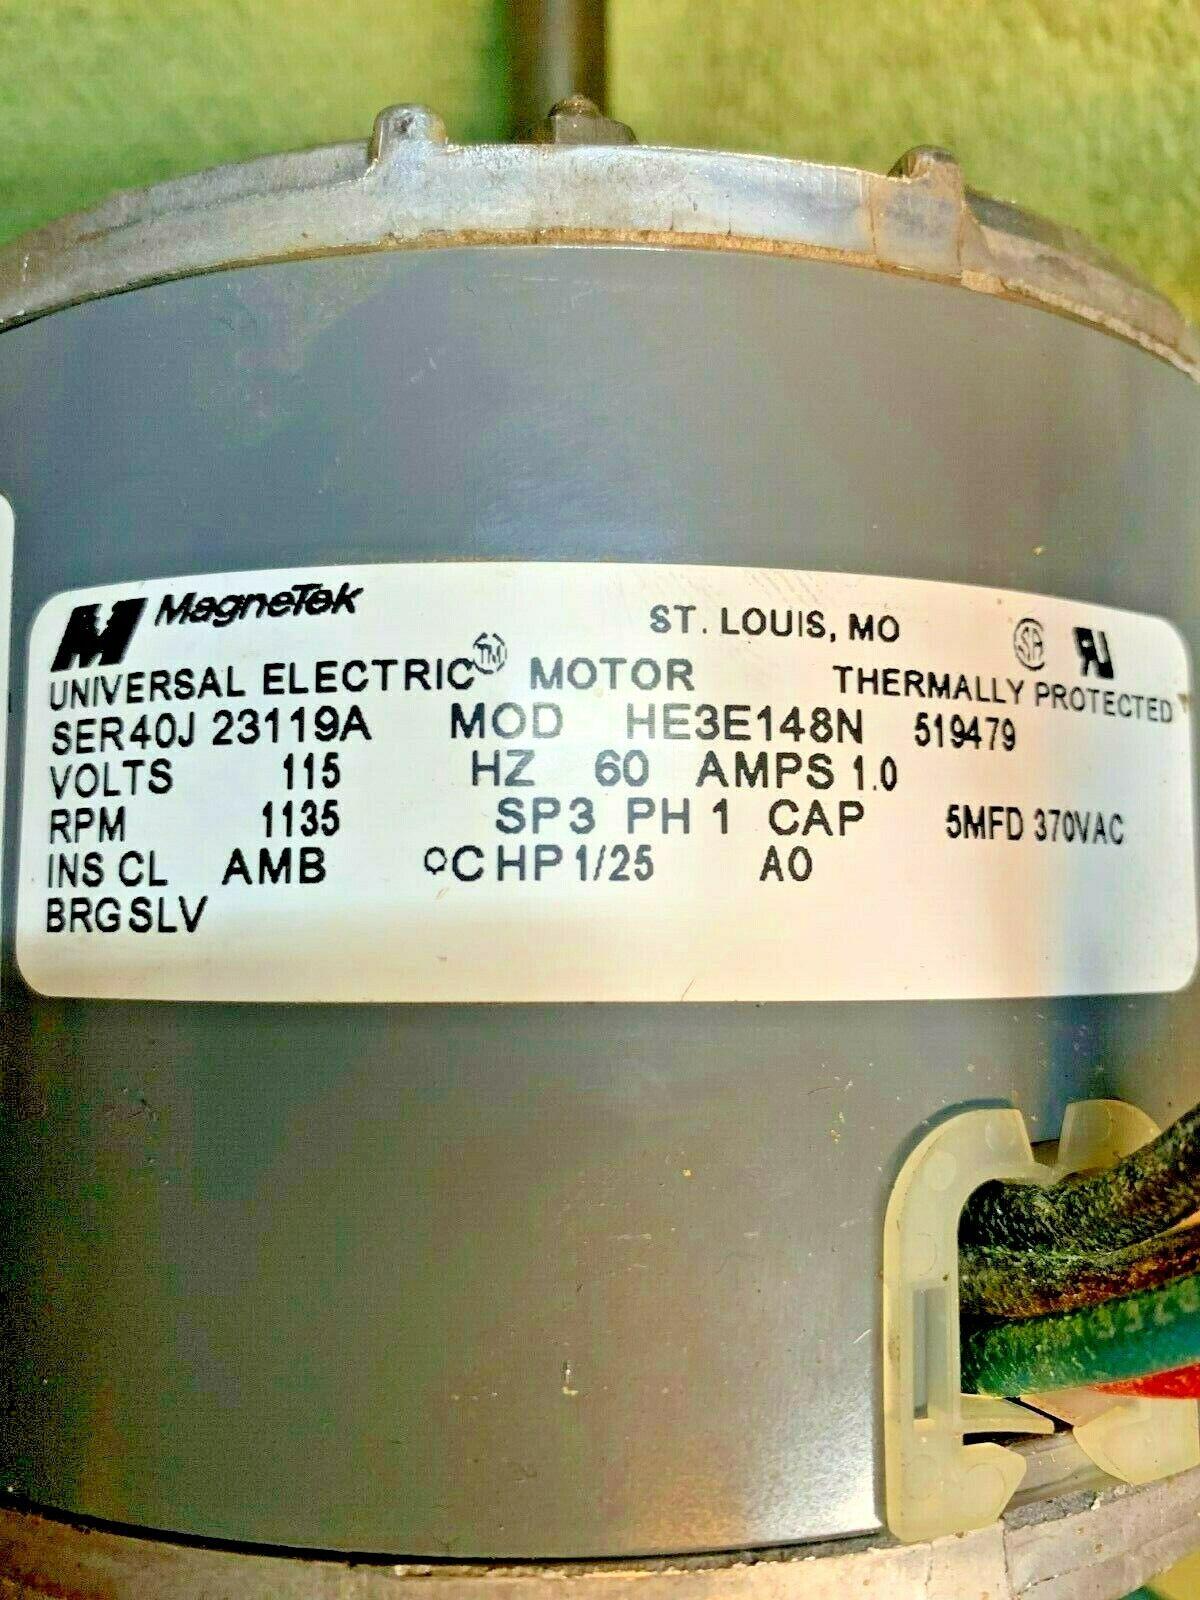 FRIGIDAIRE MAGNETEK AIR CONDITIONER MOTOR DUAL SHAFT 115 VOLT 10AMP SINGLE PHASE